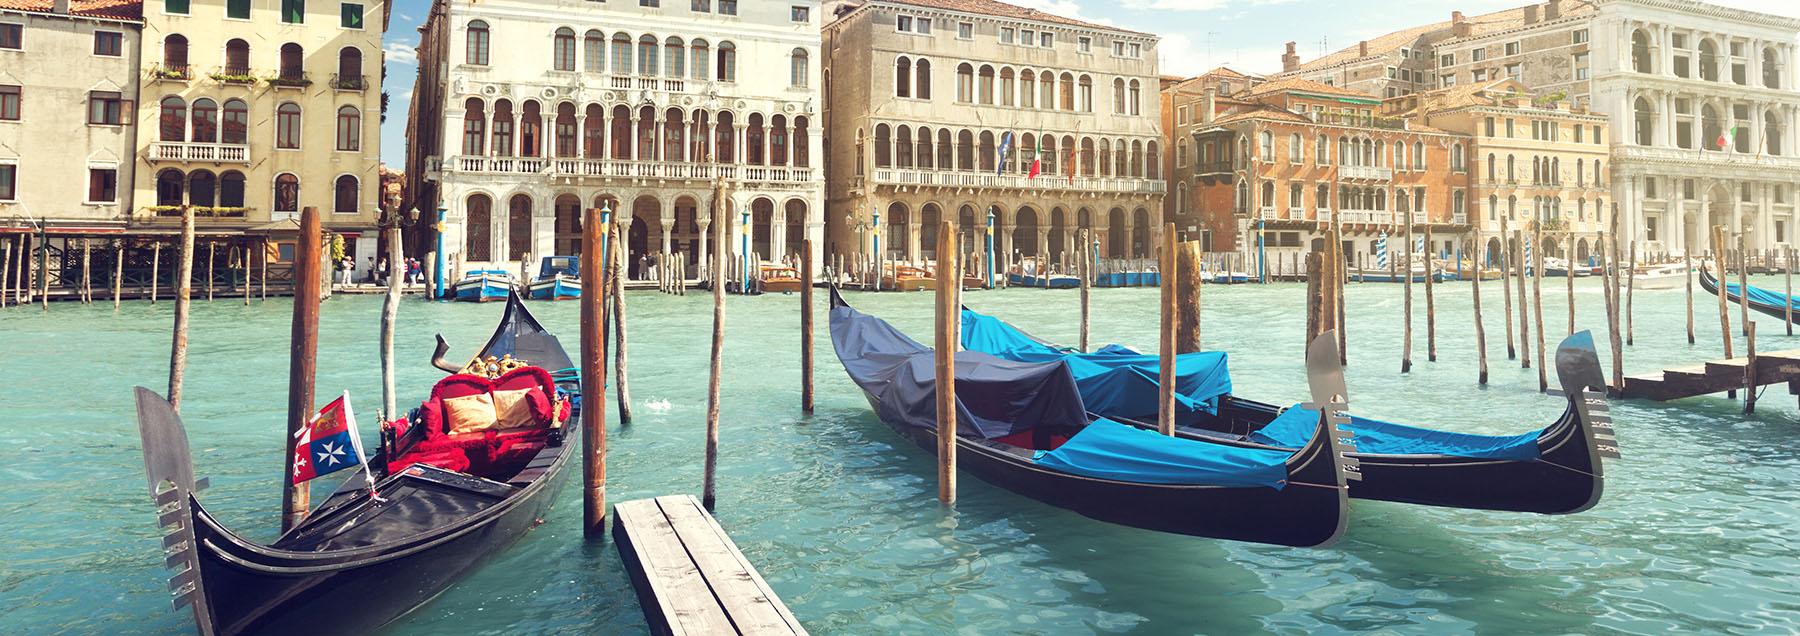 Dream of Italy – Venice